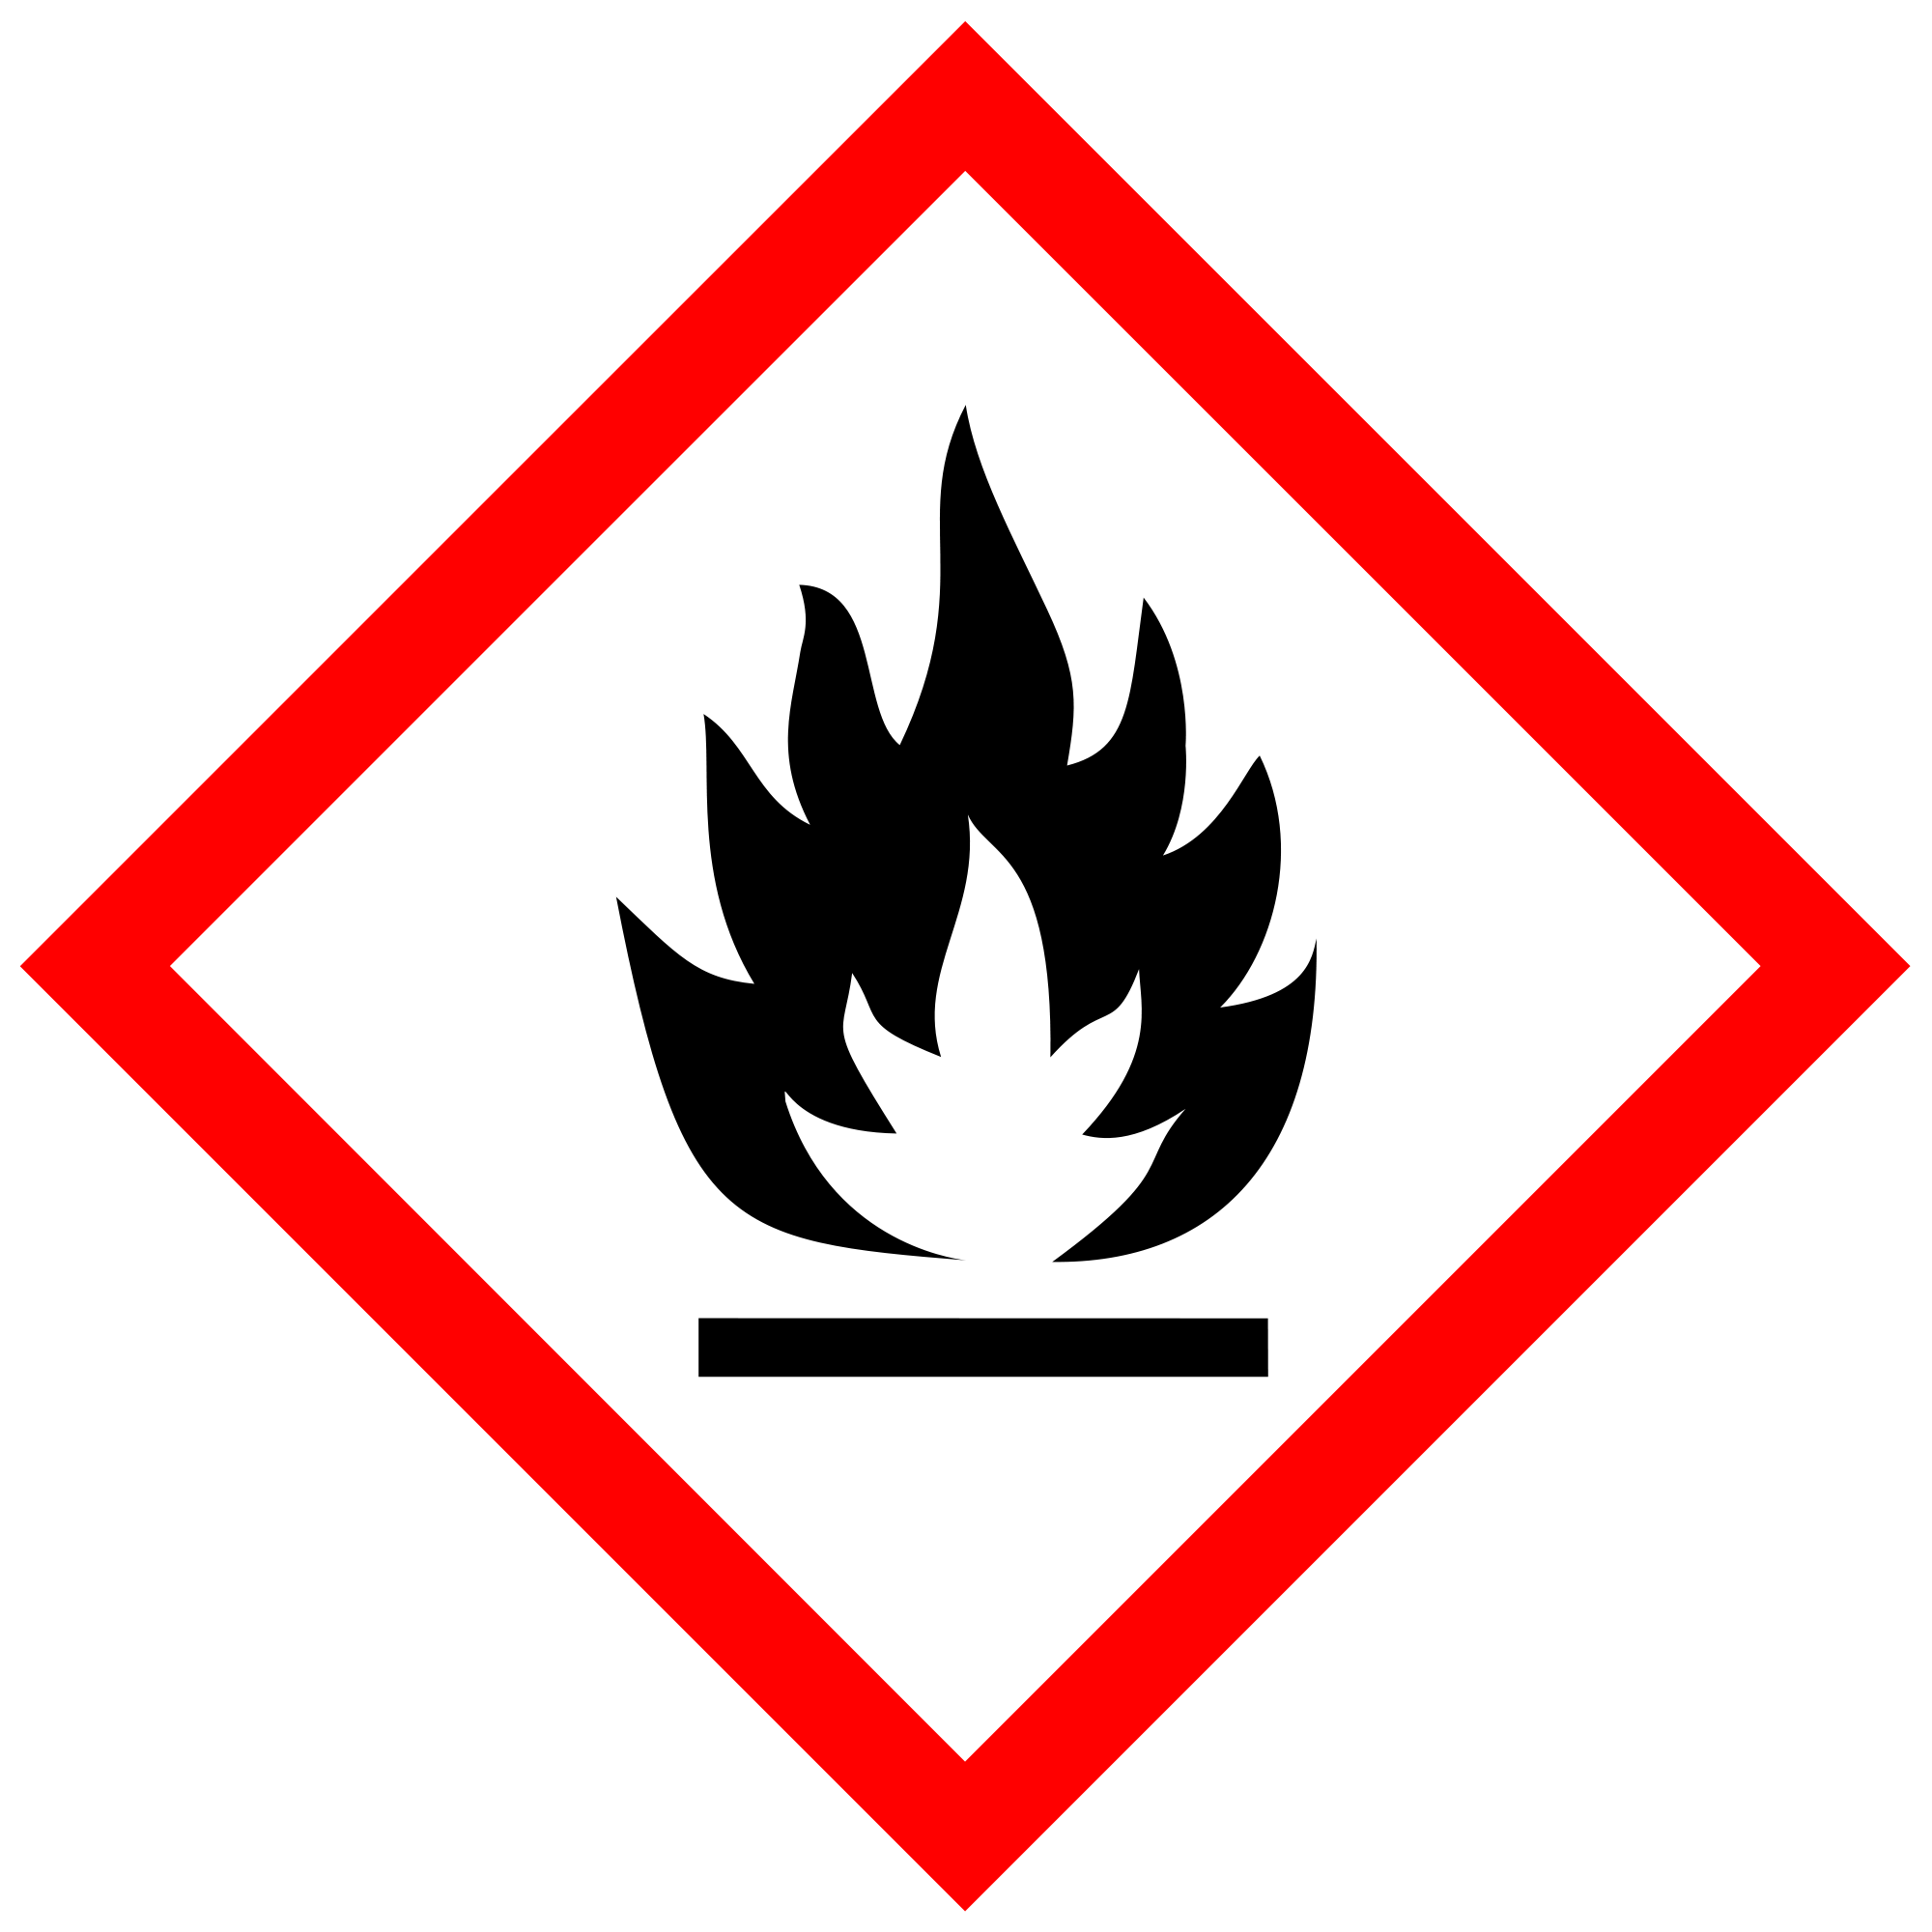 fire hazard pictogram warning signs pinterest